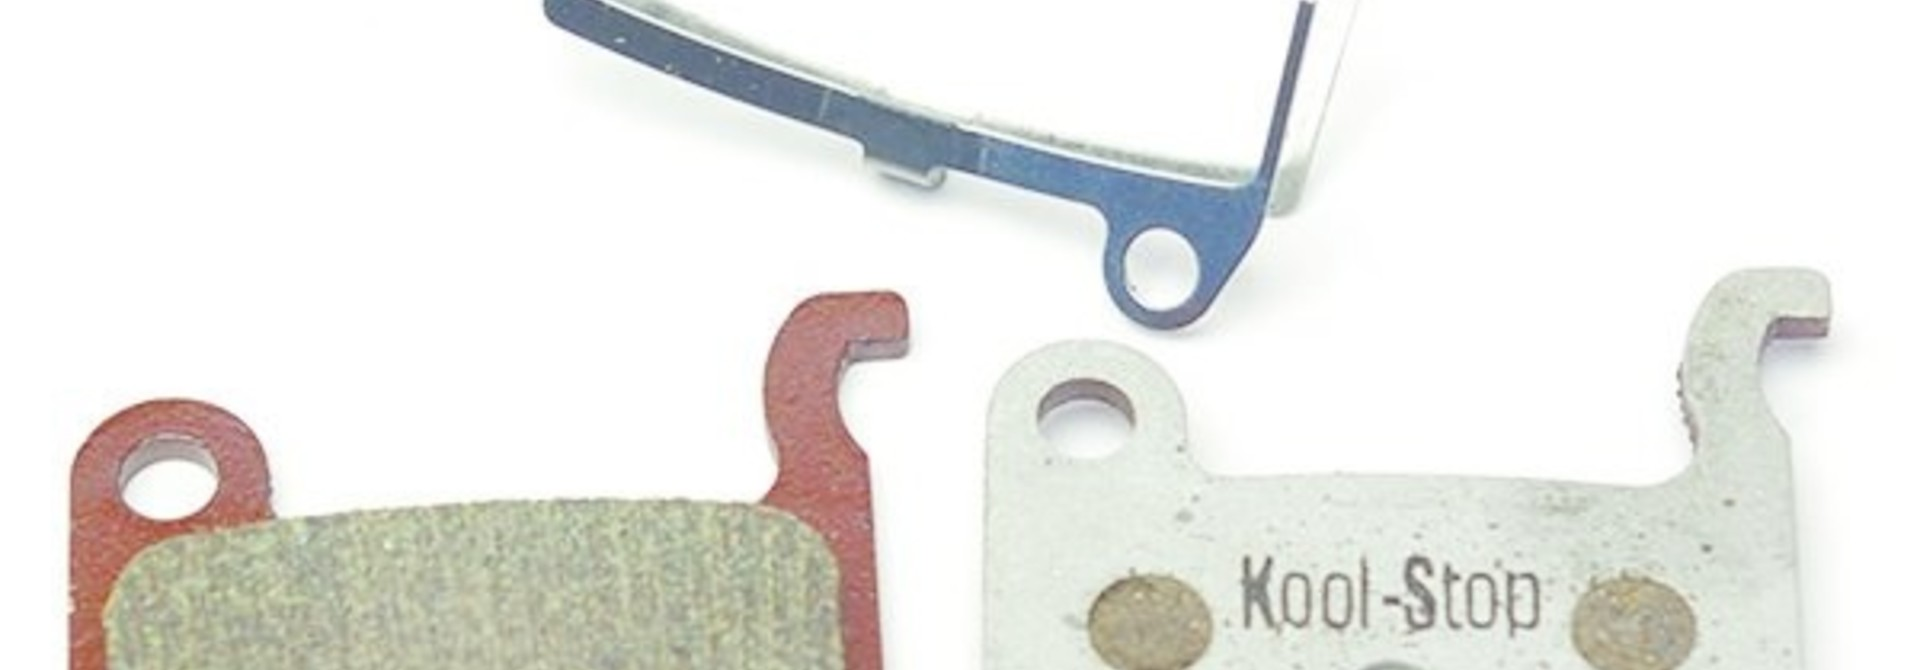 Kool-Stop Shimano Organic M965/M765 Disc Brake Pads Aluminum Plate #KS-D630A